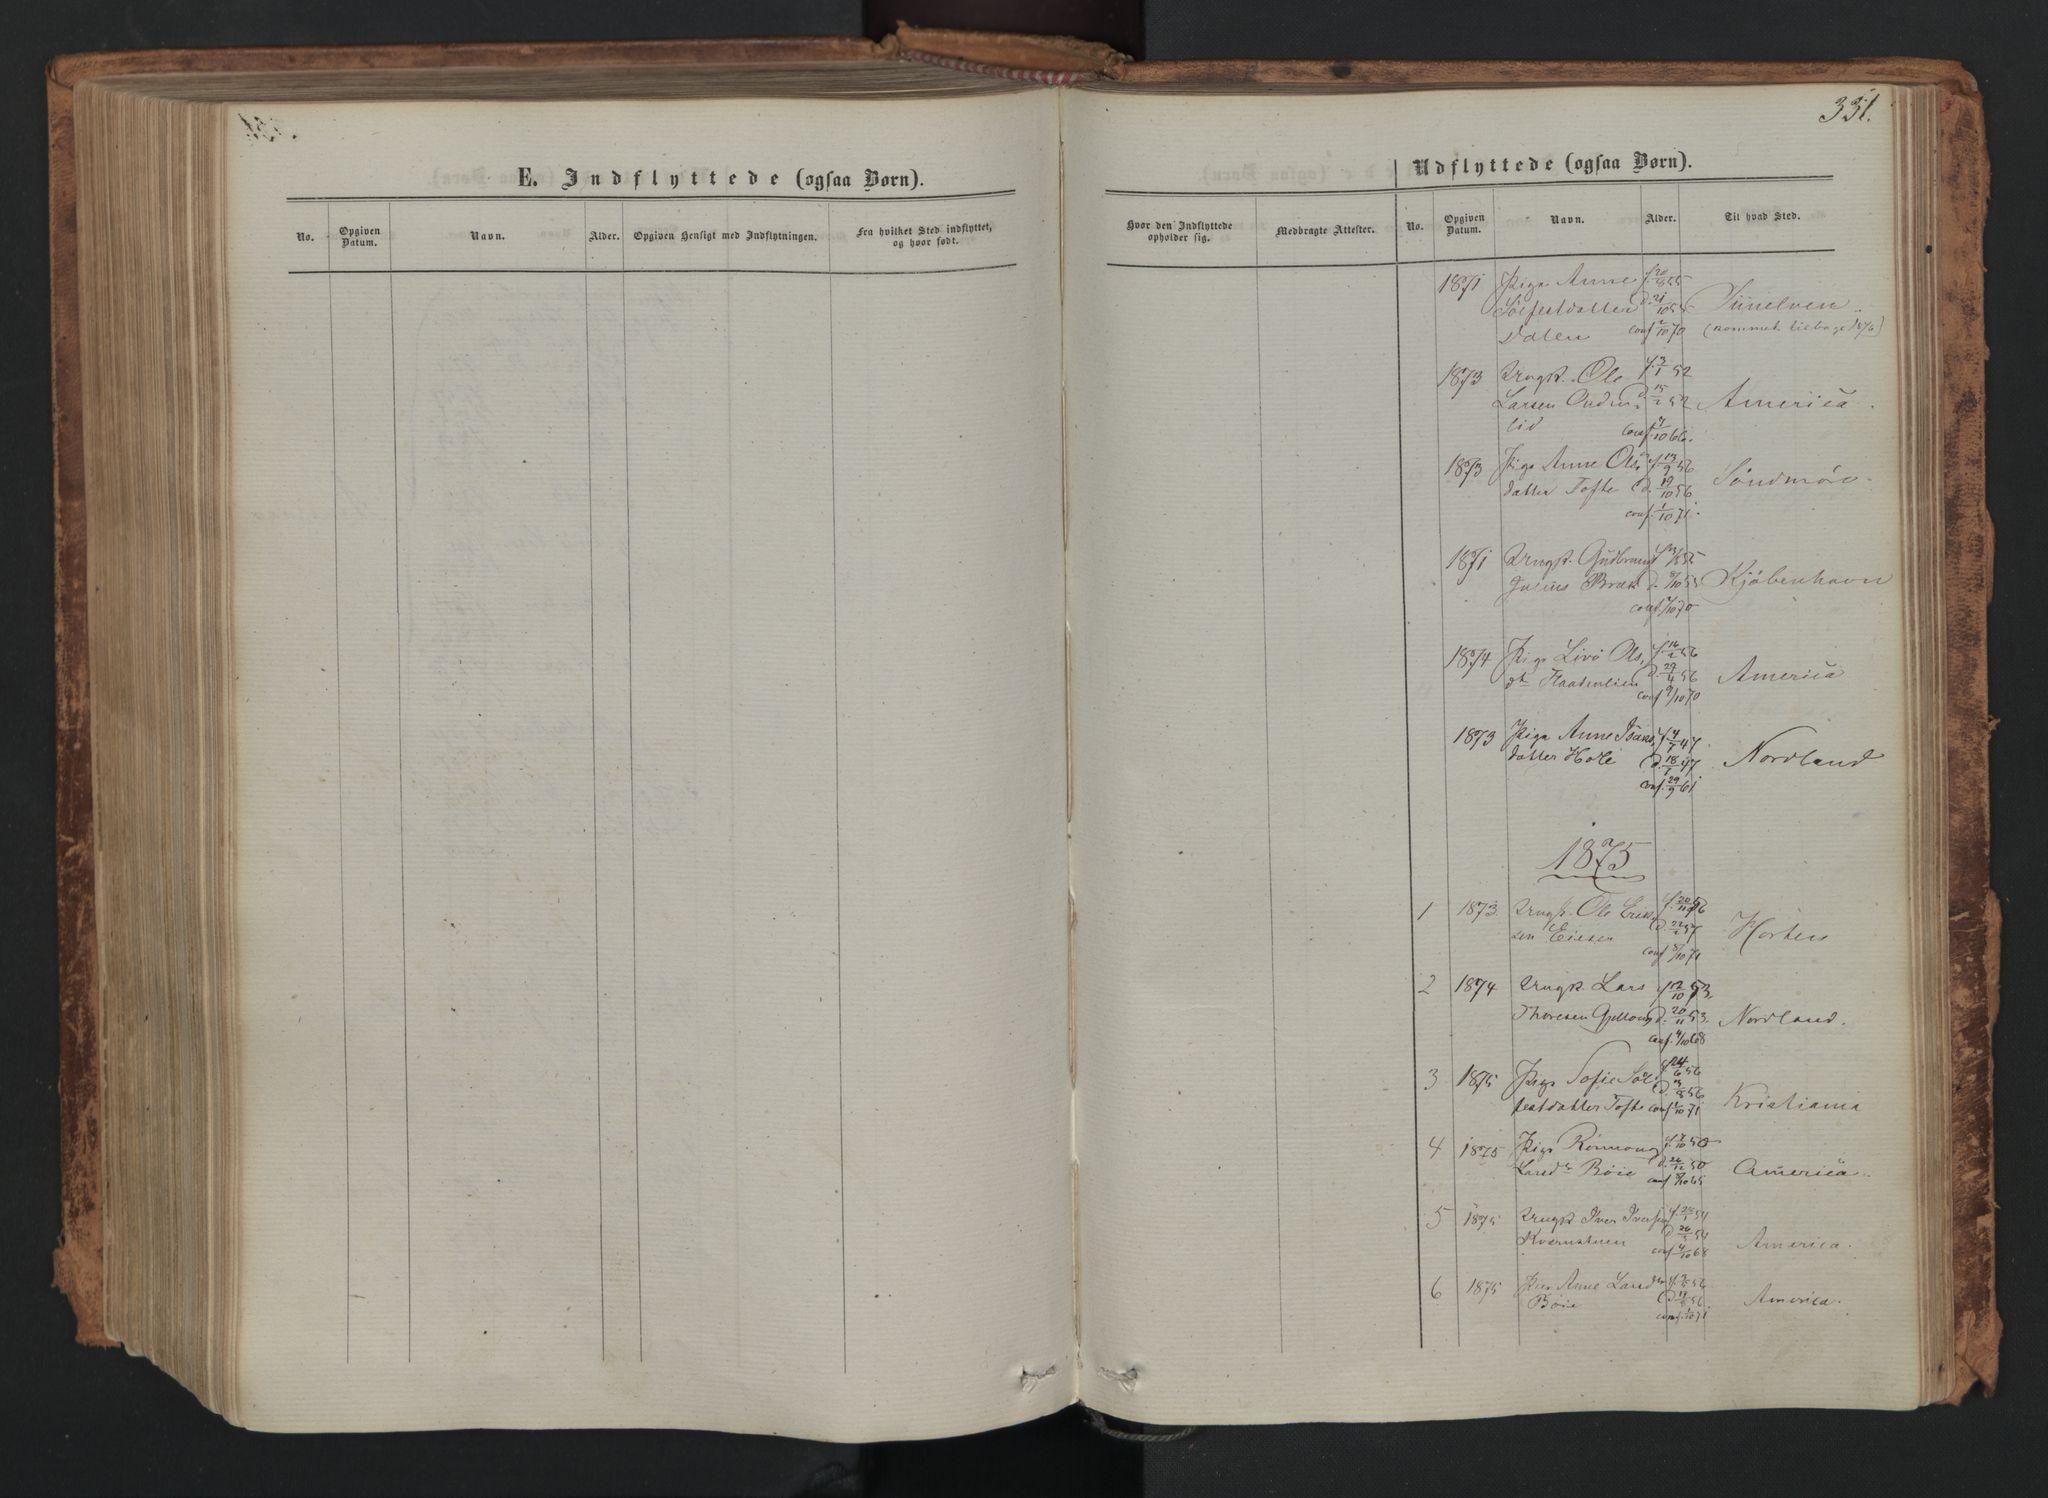 SAH, Skjåk prestekontor, Ministerialbok nr. 1, 1863-1879, s. 331